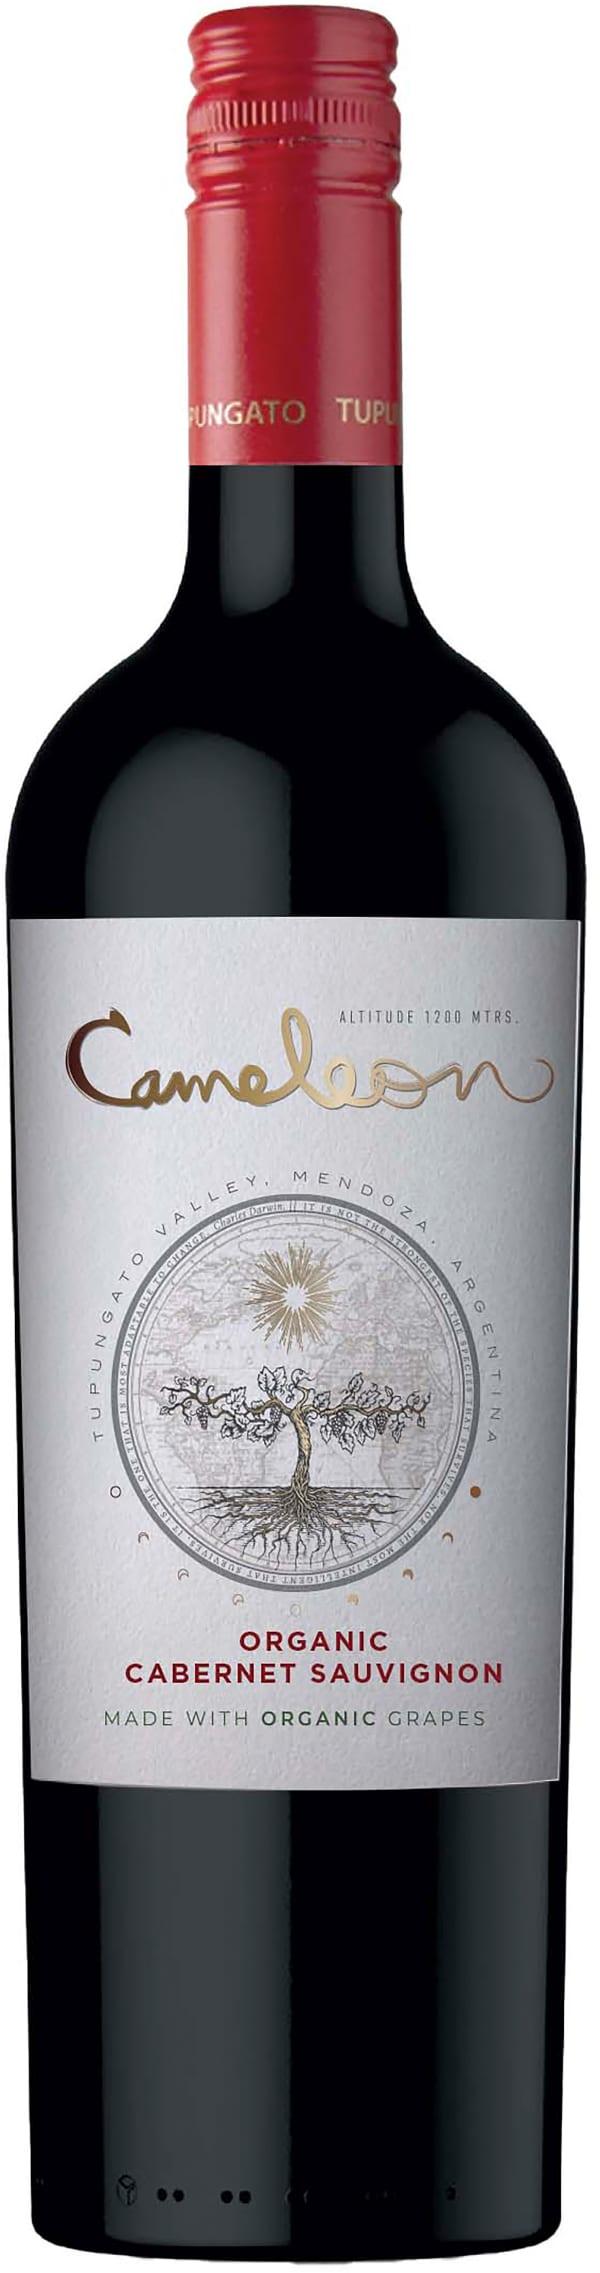 Cameleon Organic Cabernet Sauvignon 2018